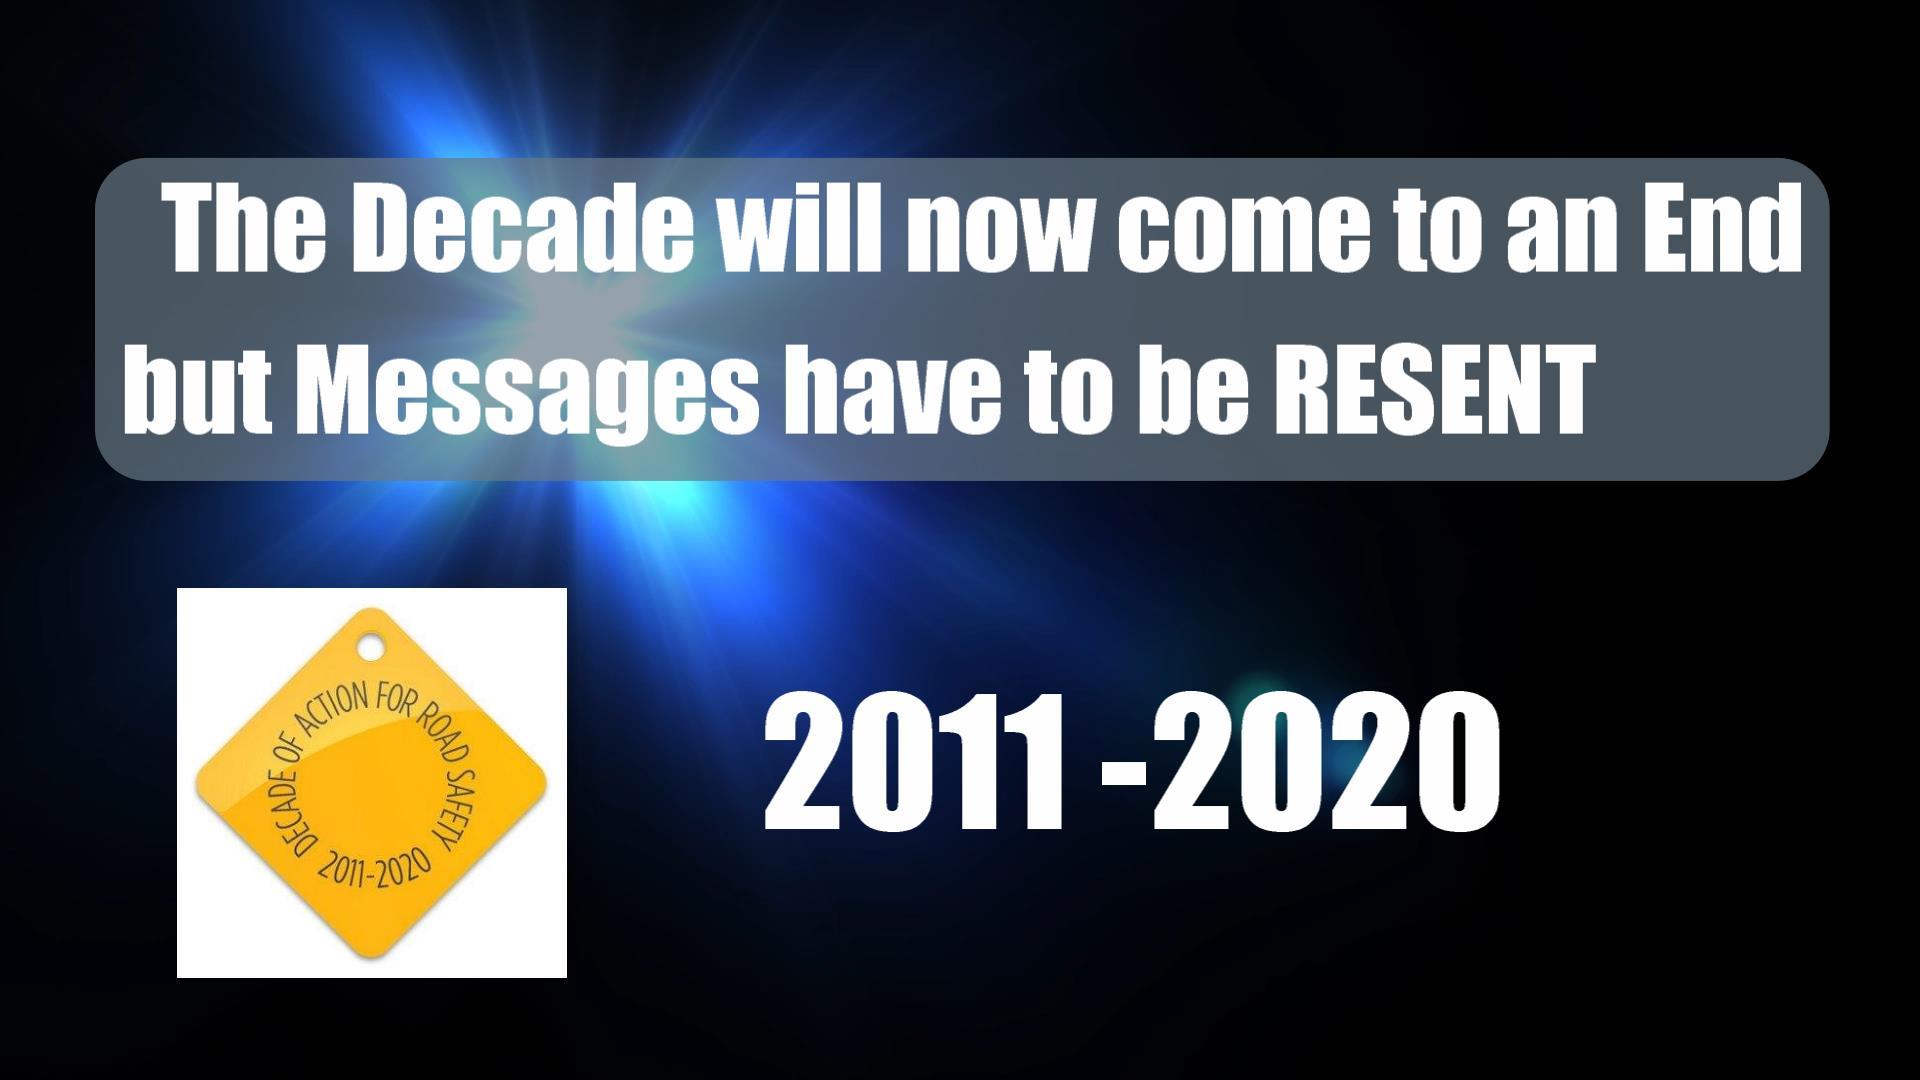 Decade 1